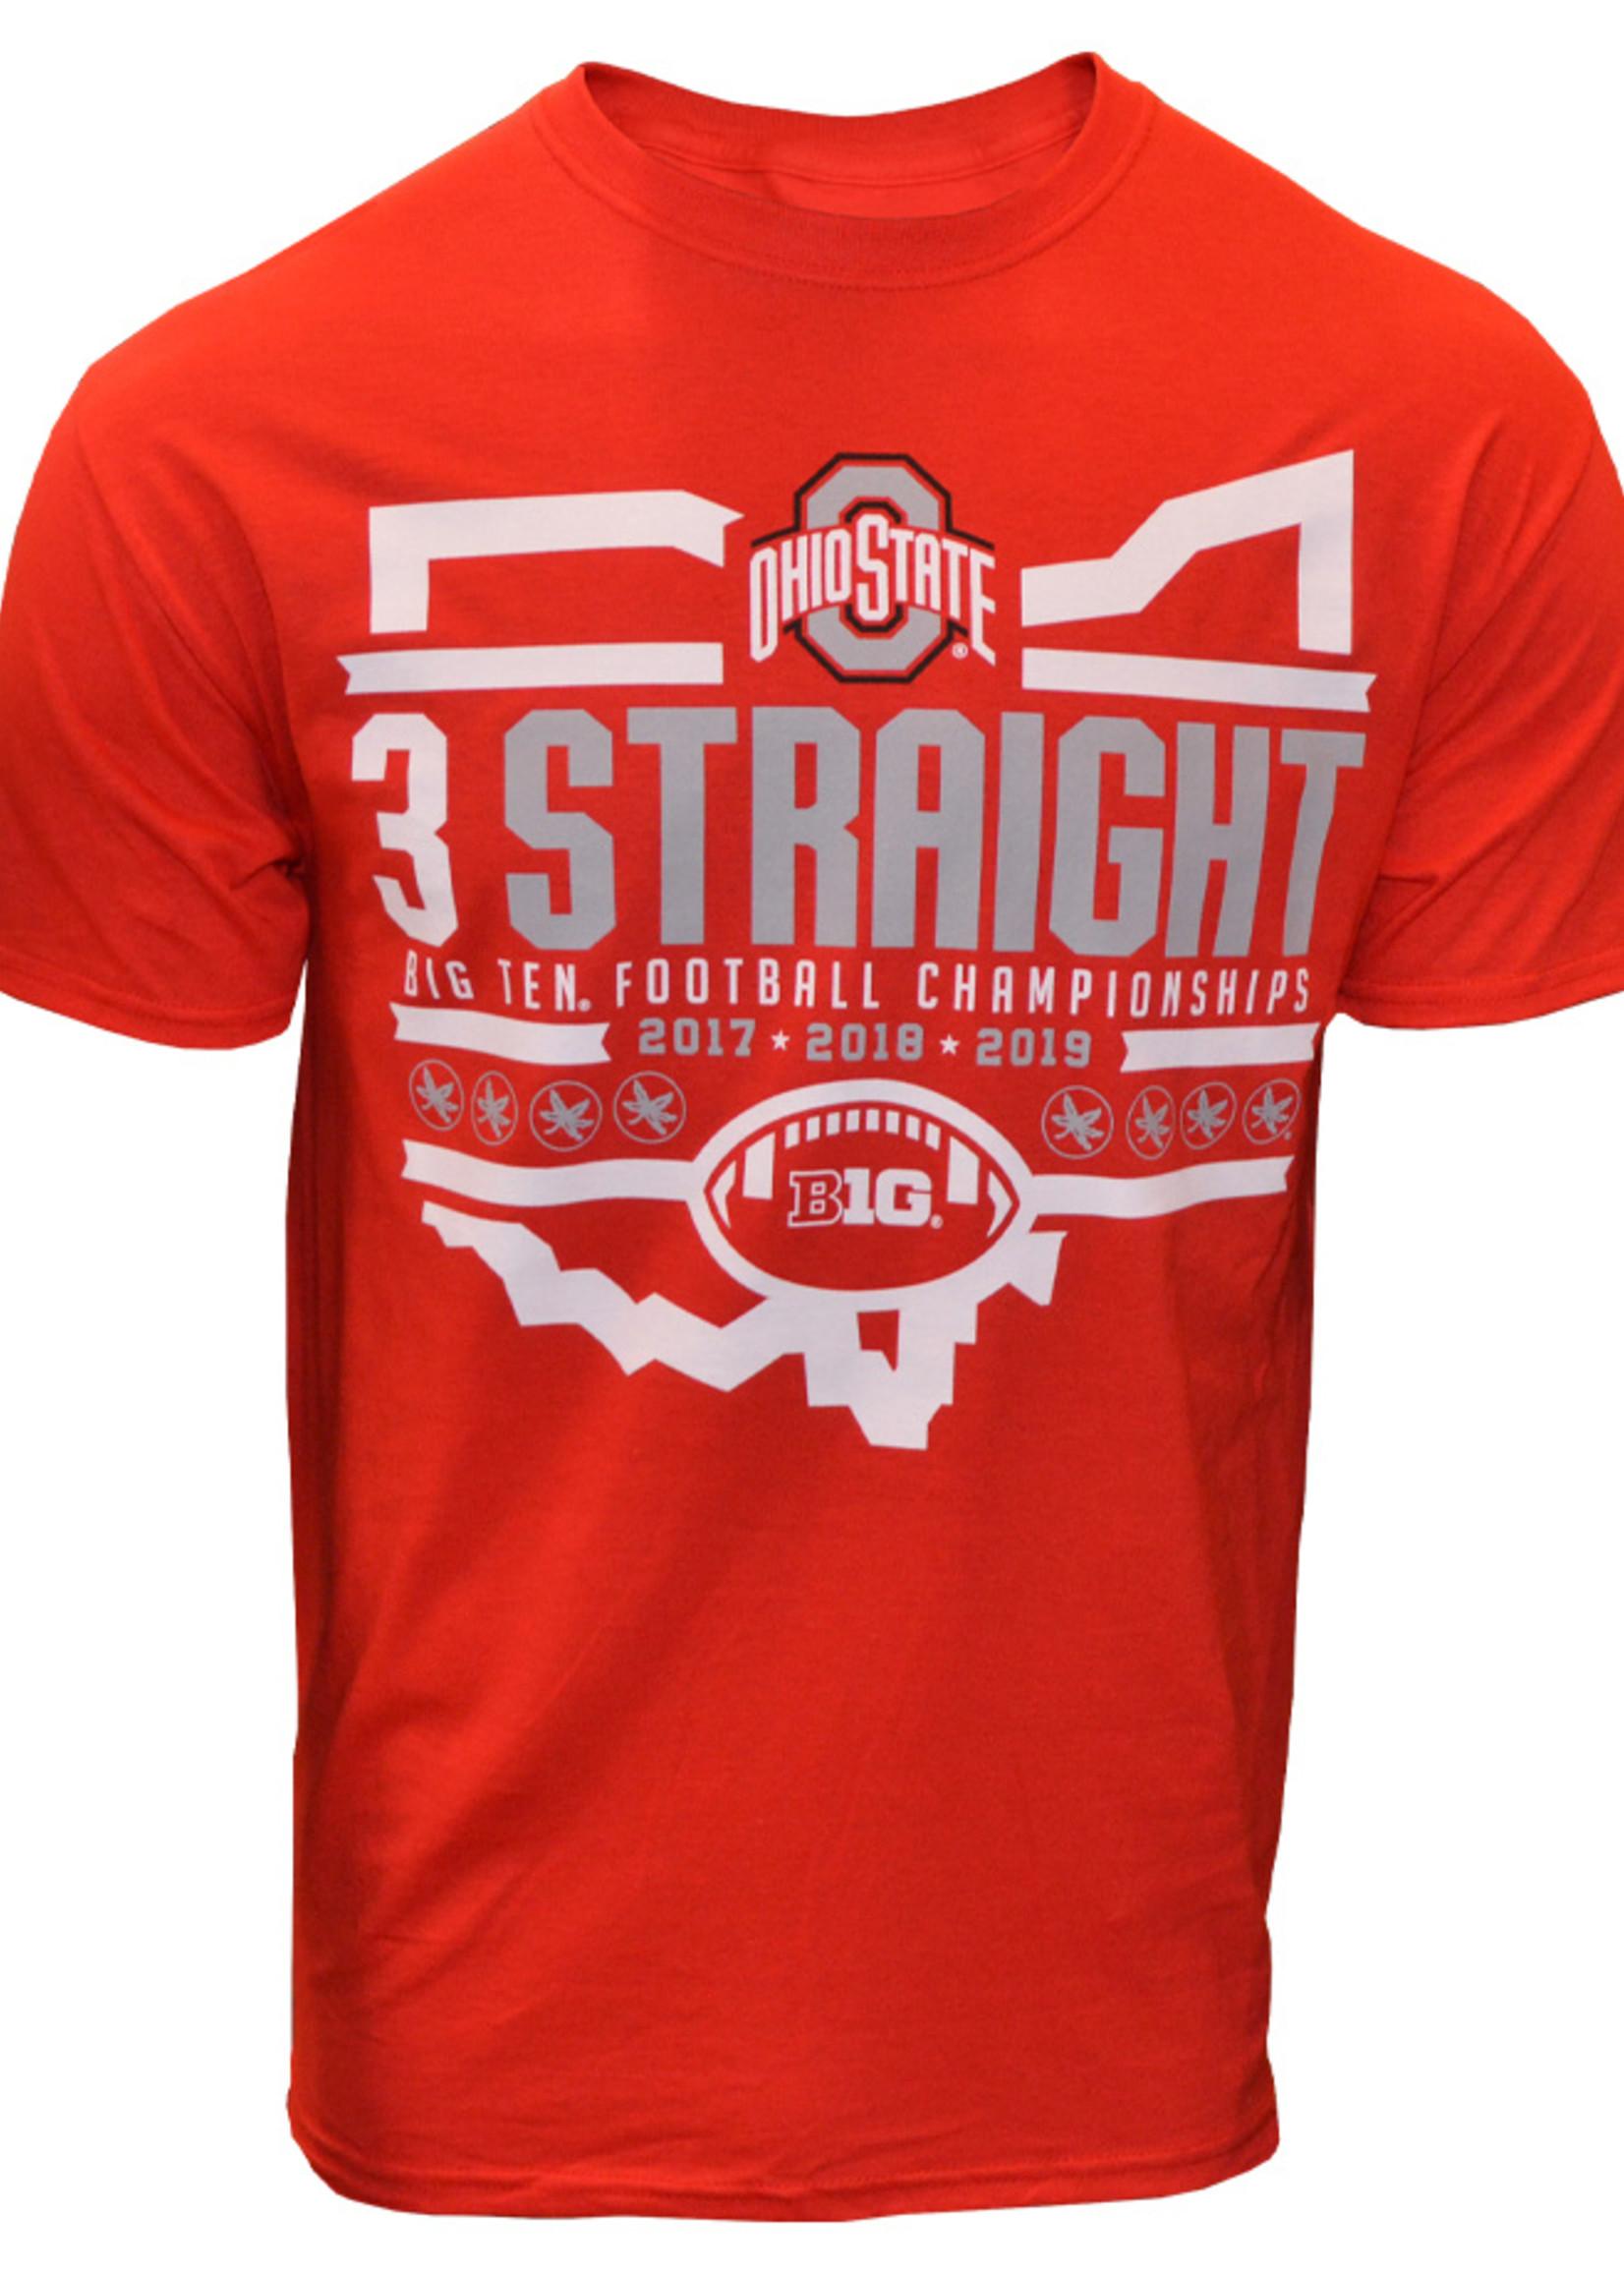 Ohio State 3 Straight Big Ten Champs Schedule Tee